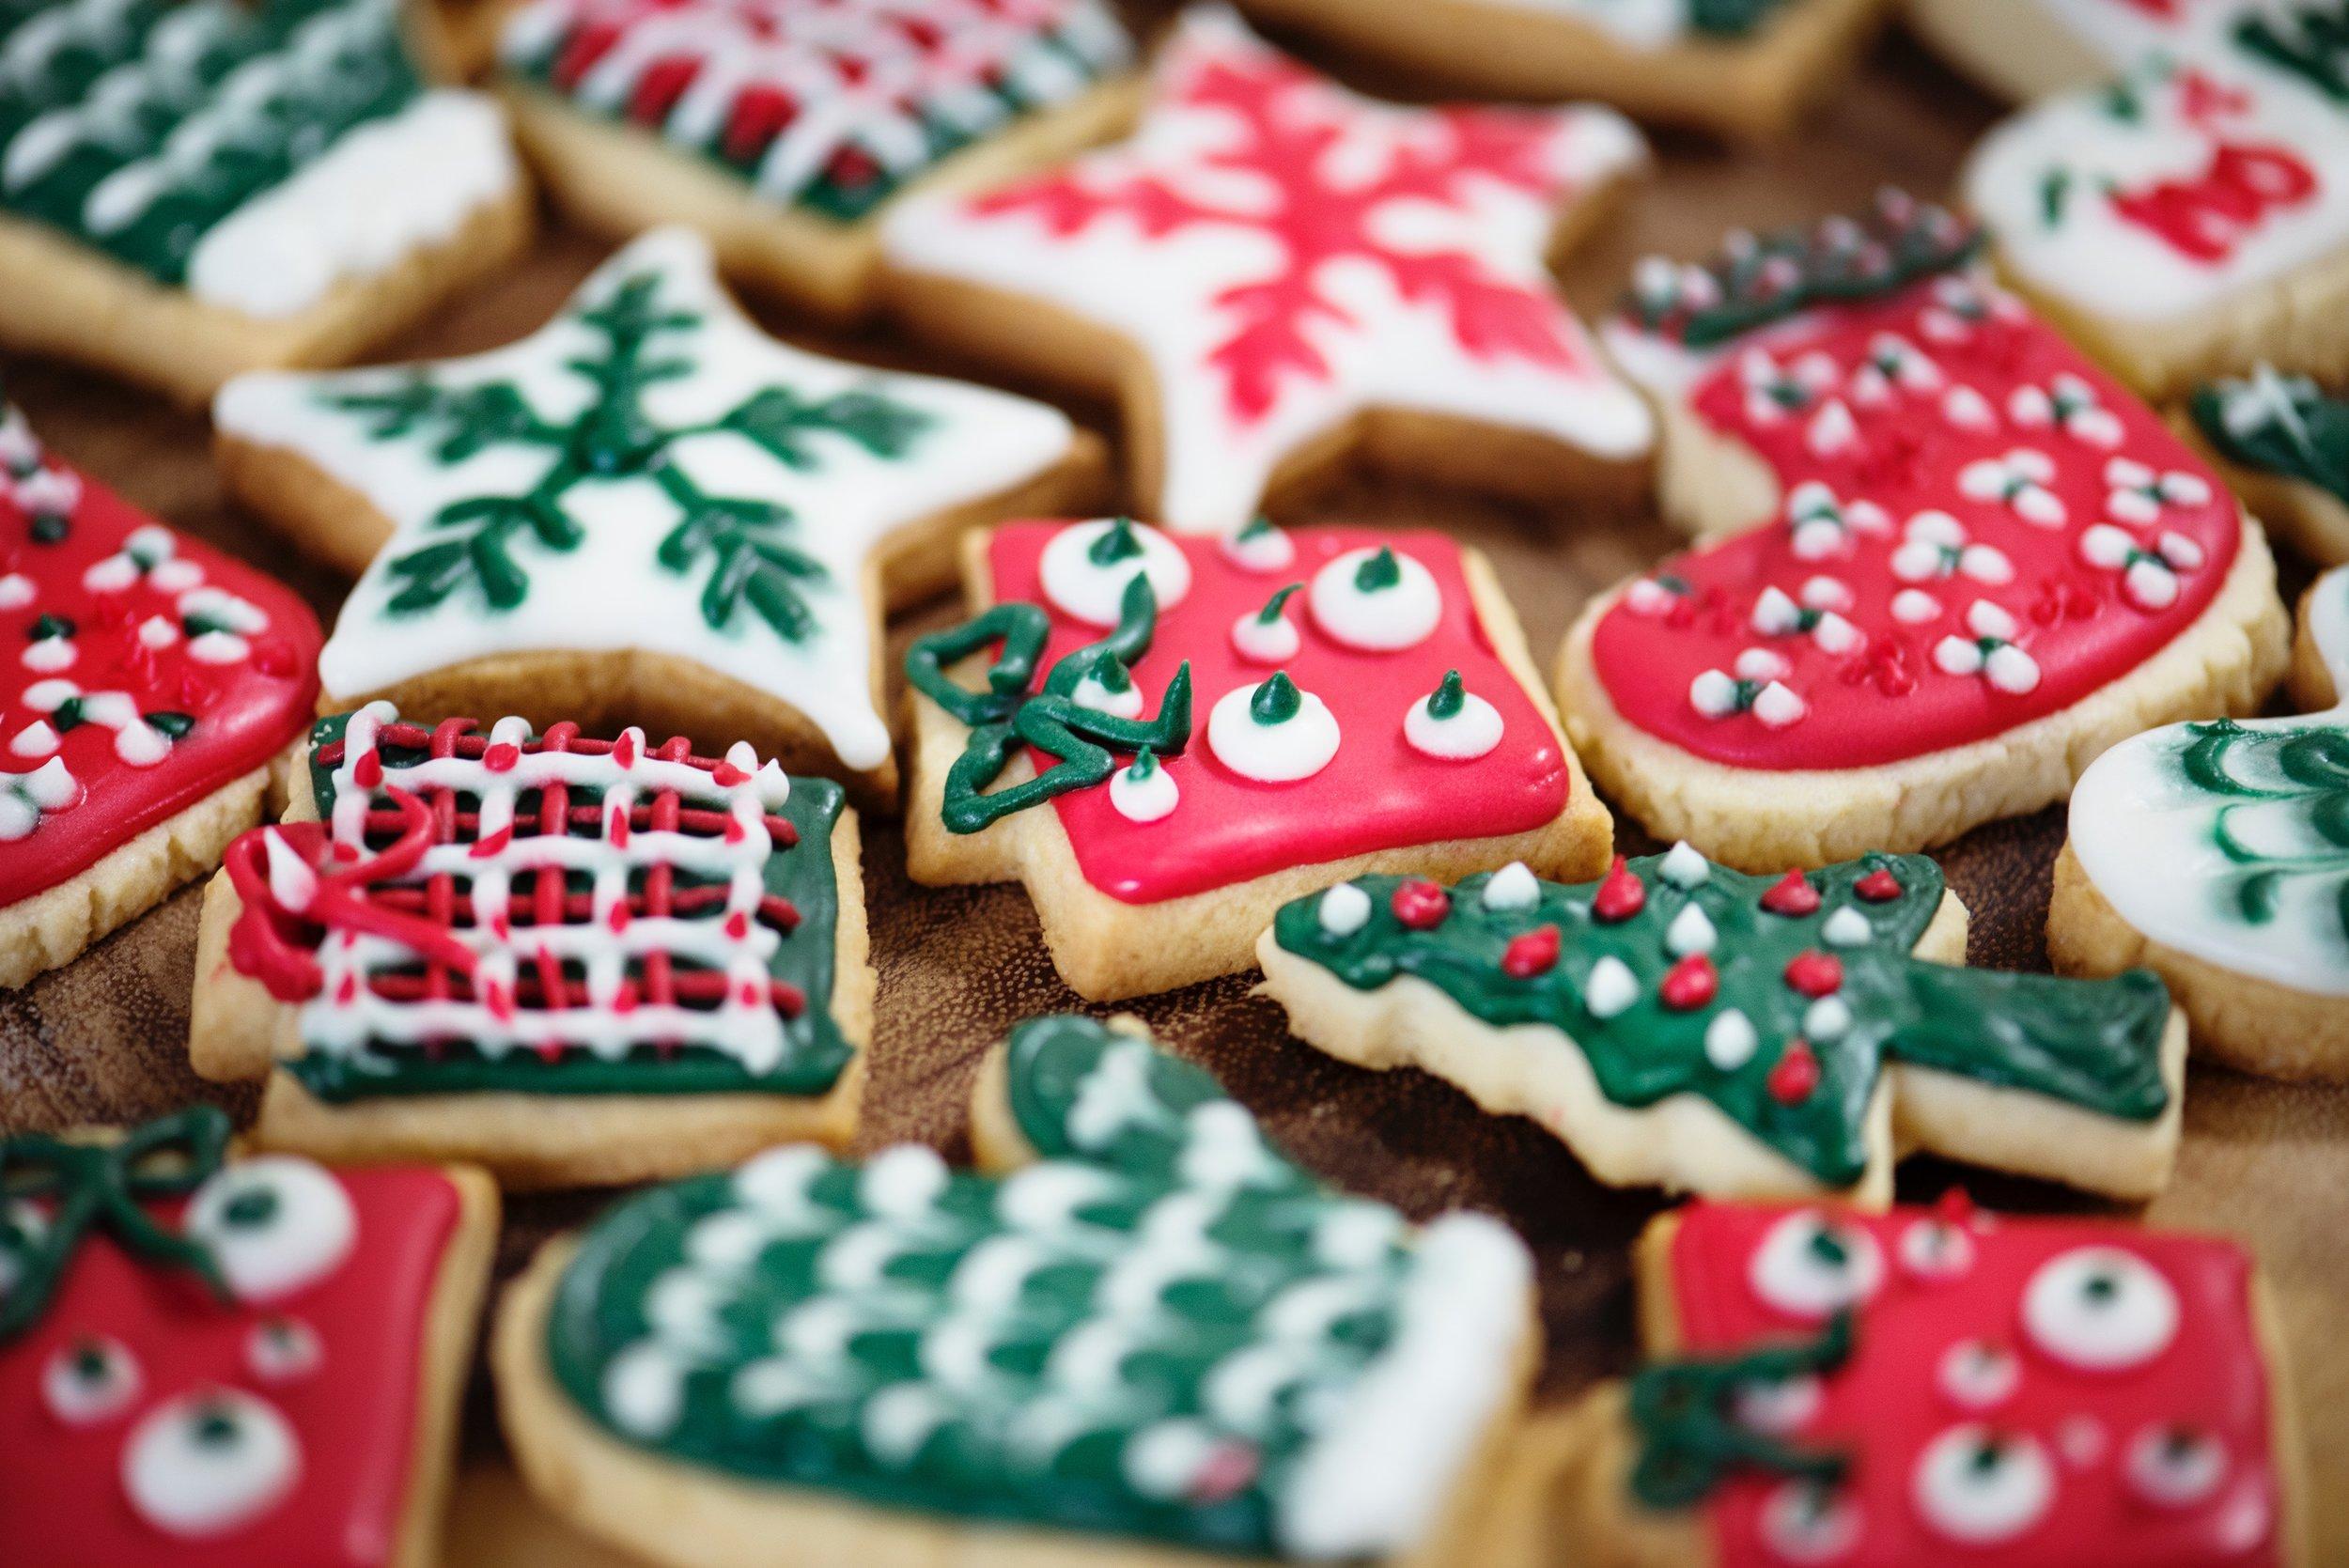 HOMETOWN HOLIDAYS - Kountry Kids 4-H Craft Bazaar and Bake Sale - December 7, 2019 -